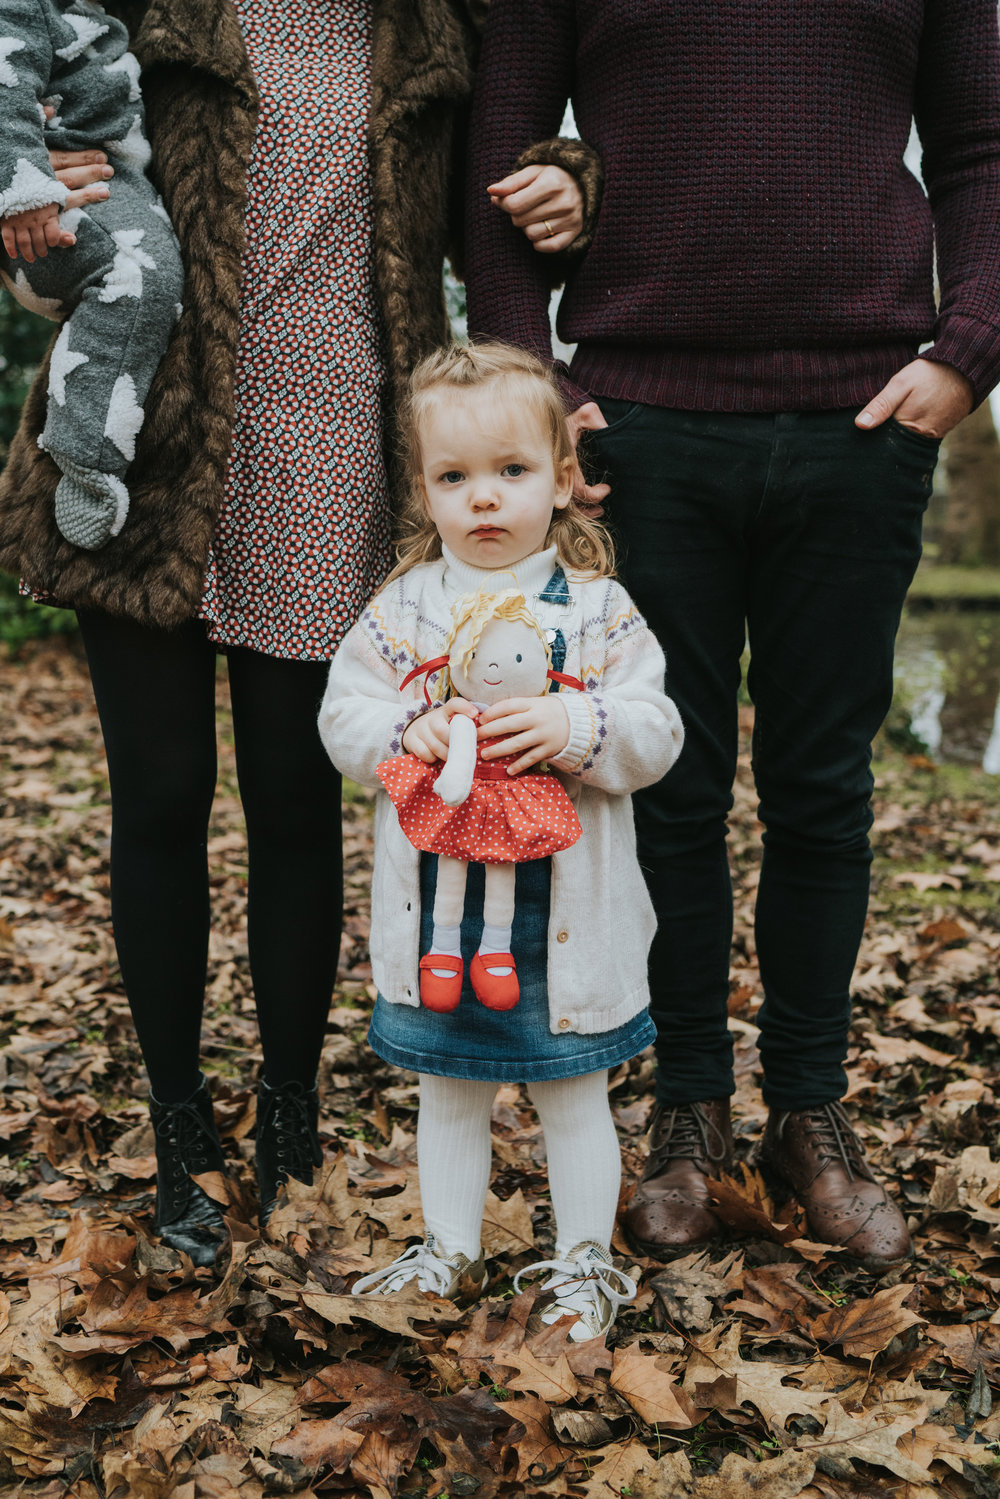 Hertfordshire-extended-family-session-grace-elizabeth-colchester-essex-alternative-wedding-photographer-suffolk-devon-norfolk (5 of 26).jpg